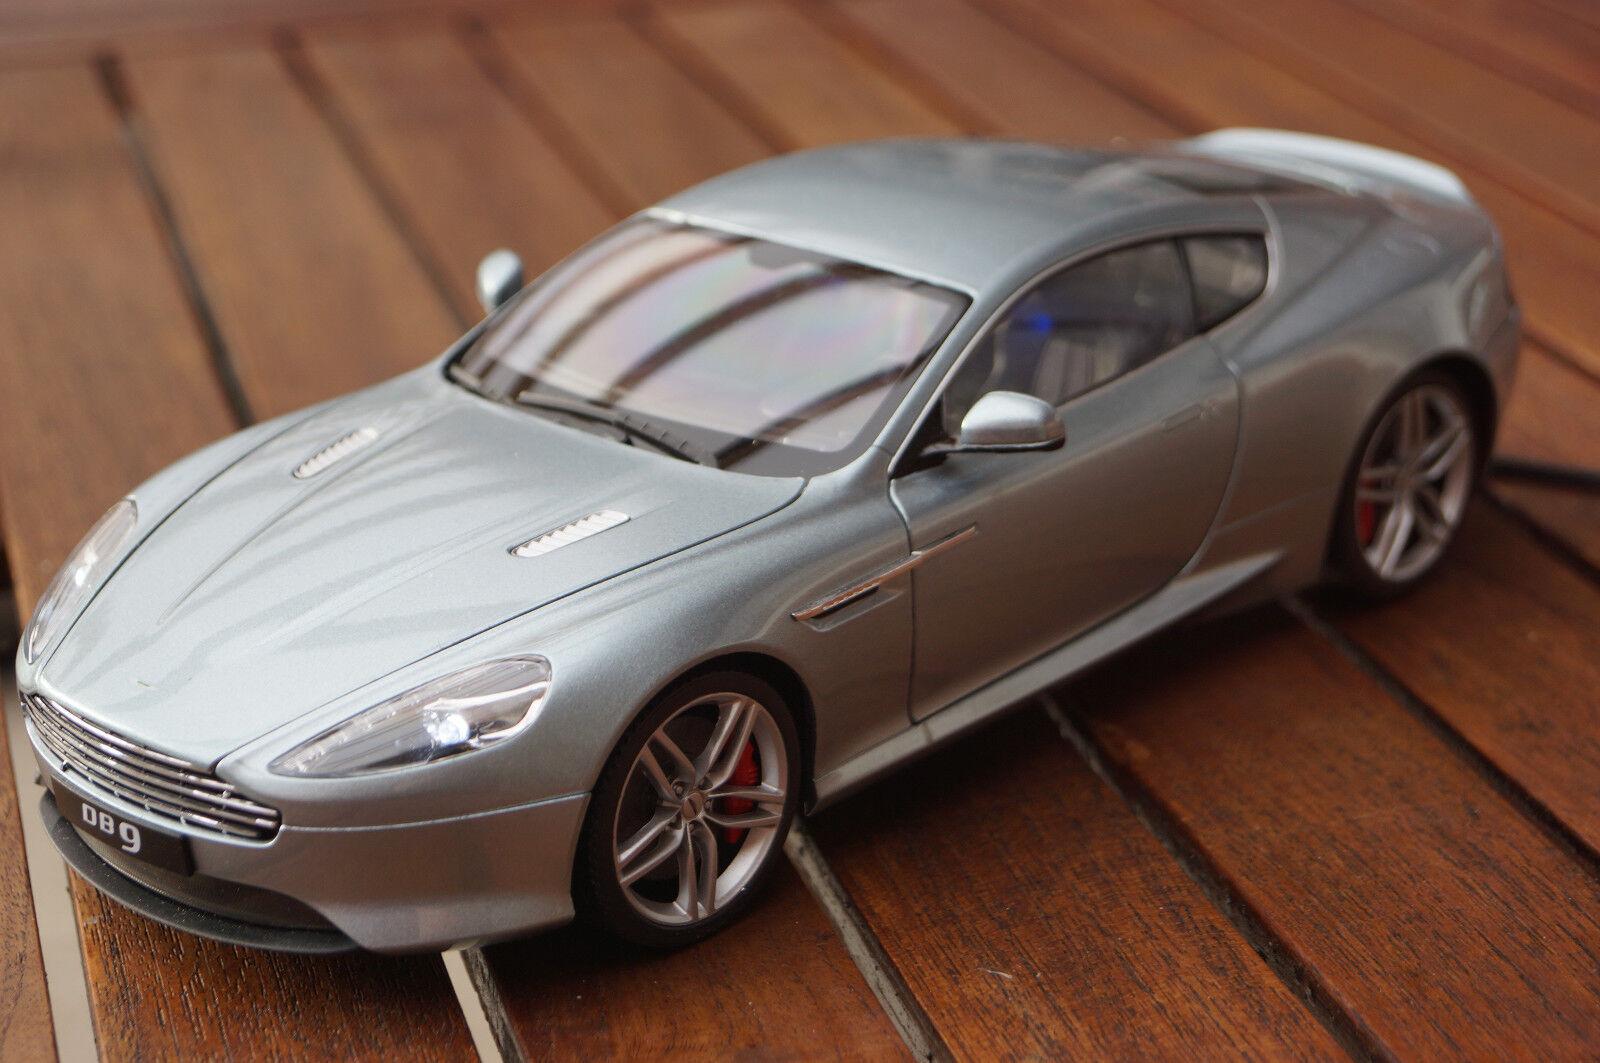 Aston Martin db9 avec LED-éclairage (xénon) dans 1 18 tuning welly Argent